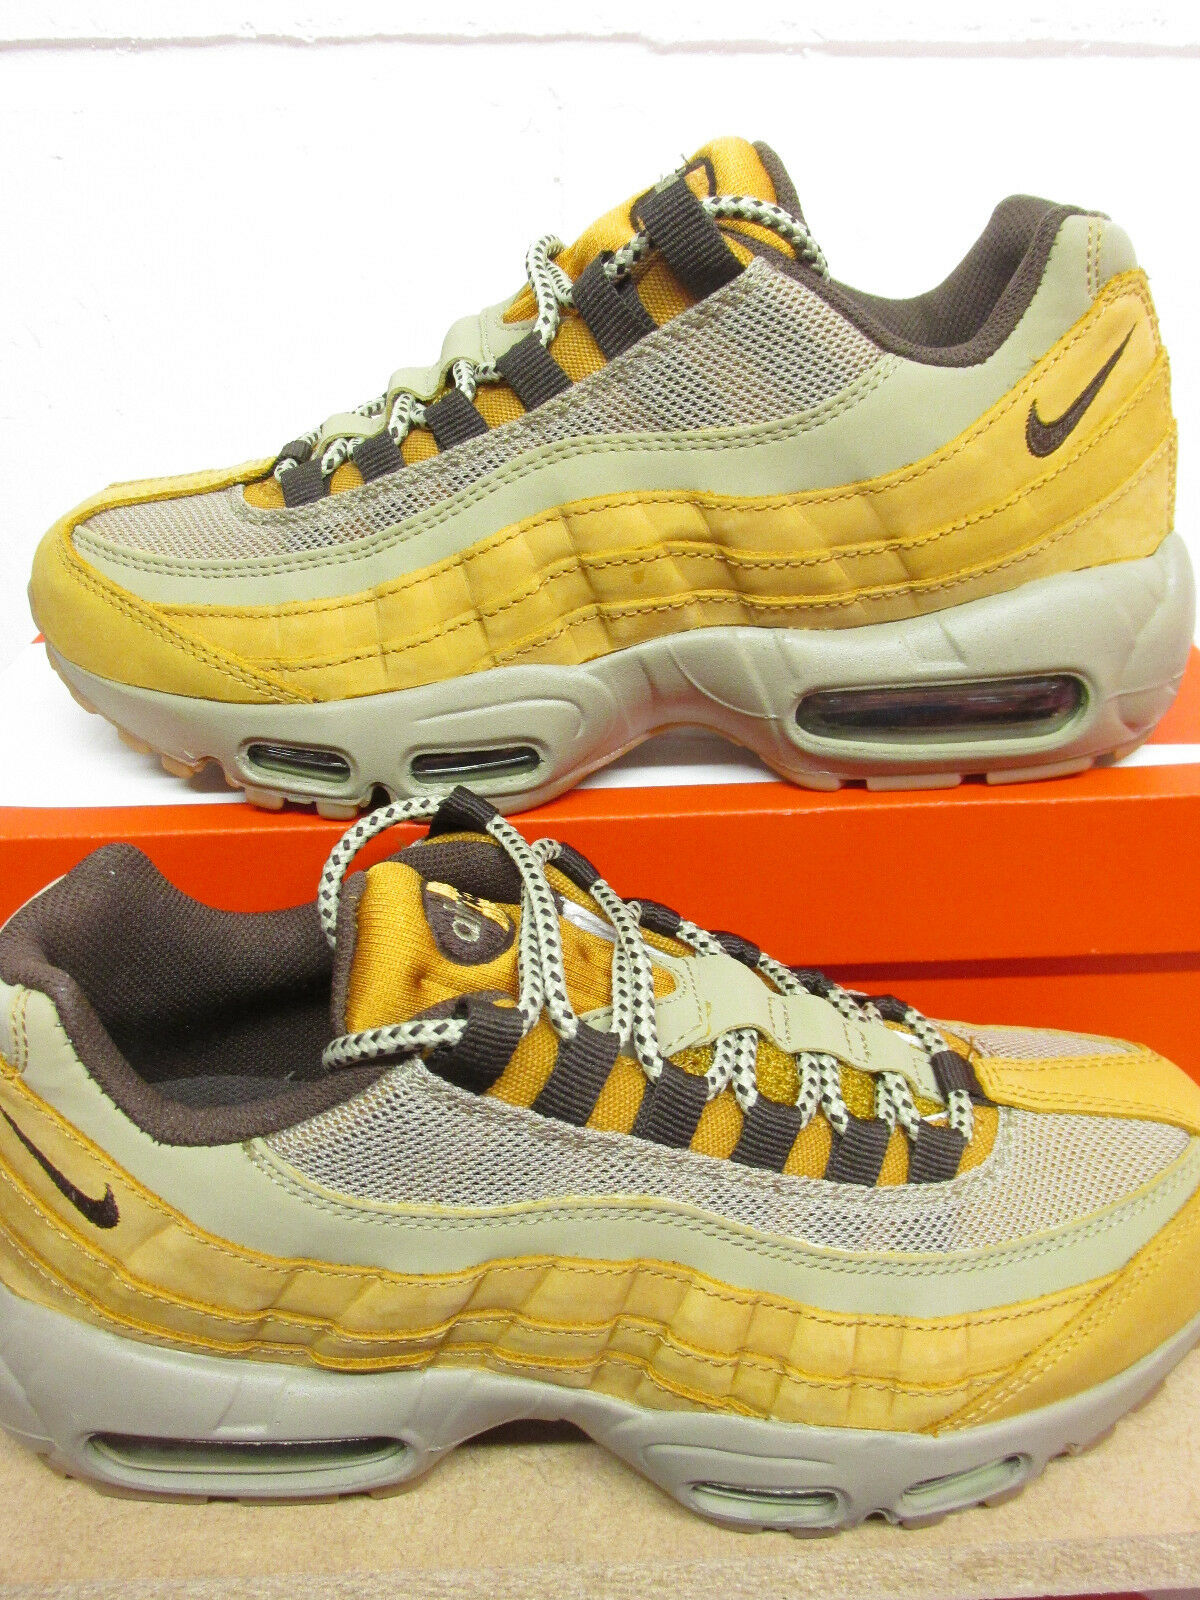 Nike Femmes Air Max 95 Hiver Basket Course 880303 700 Baskets